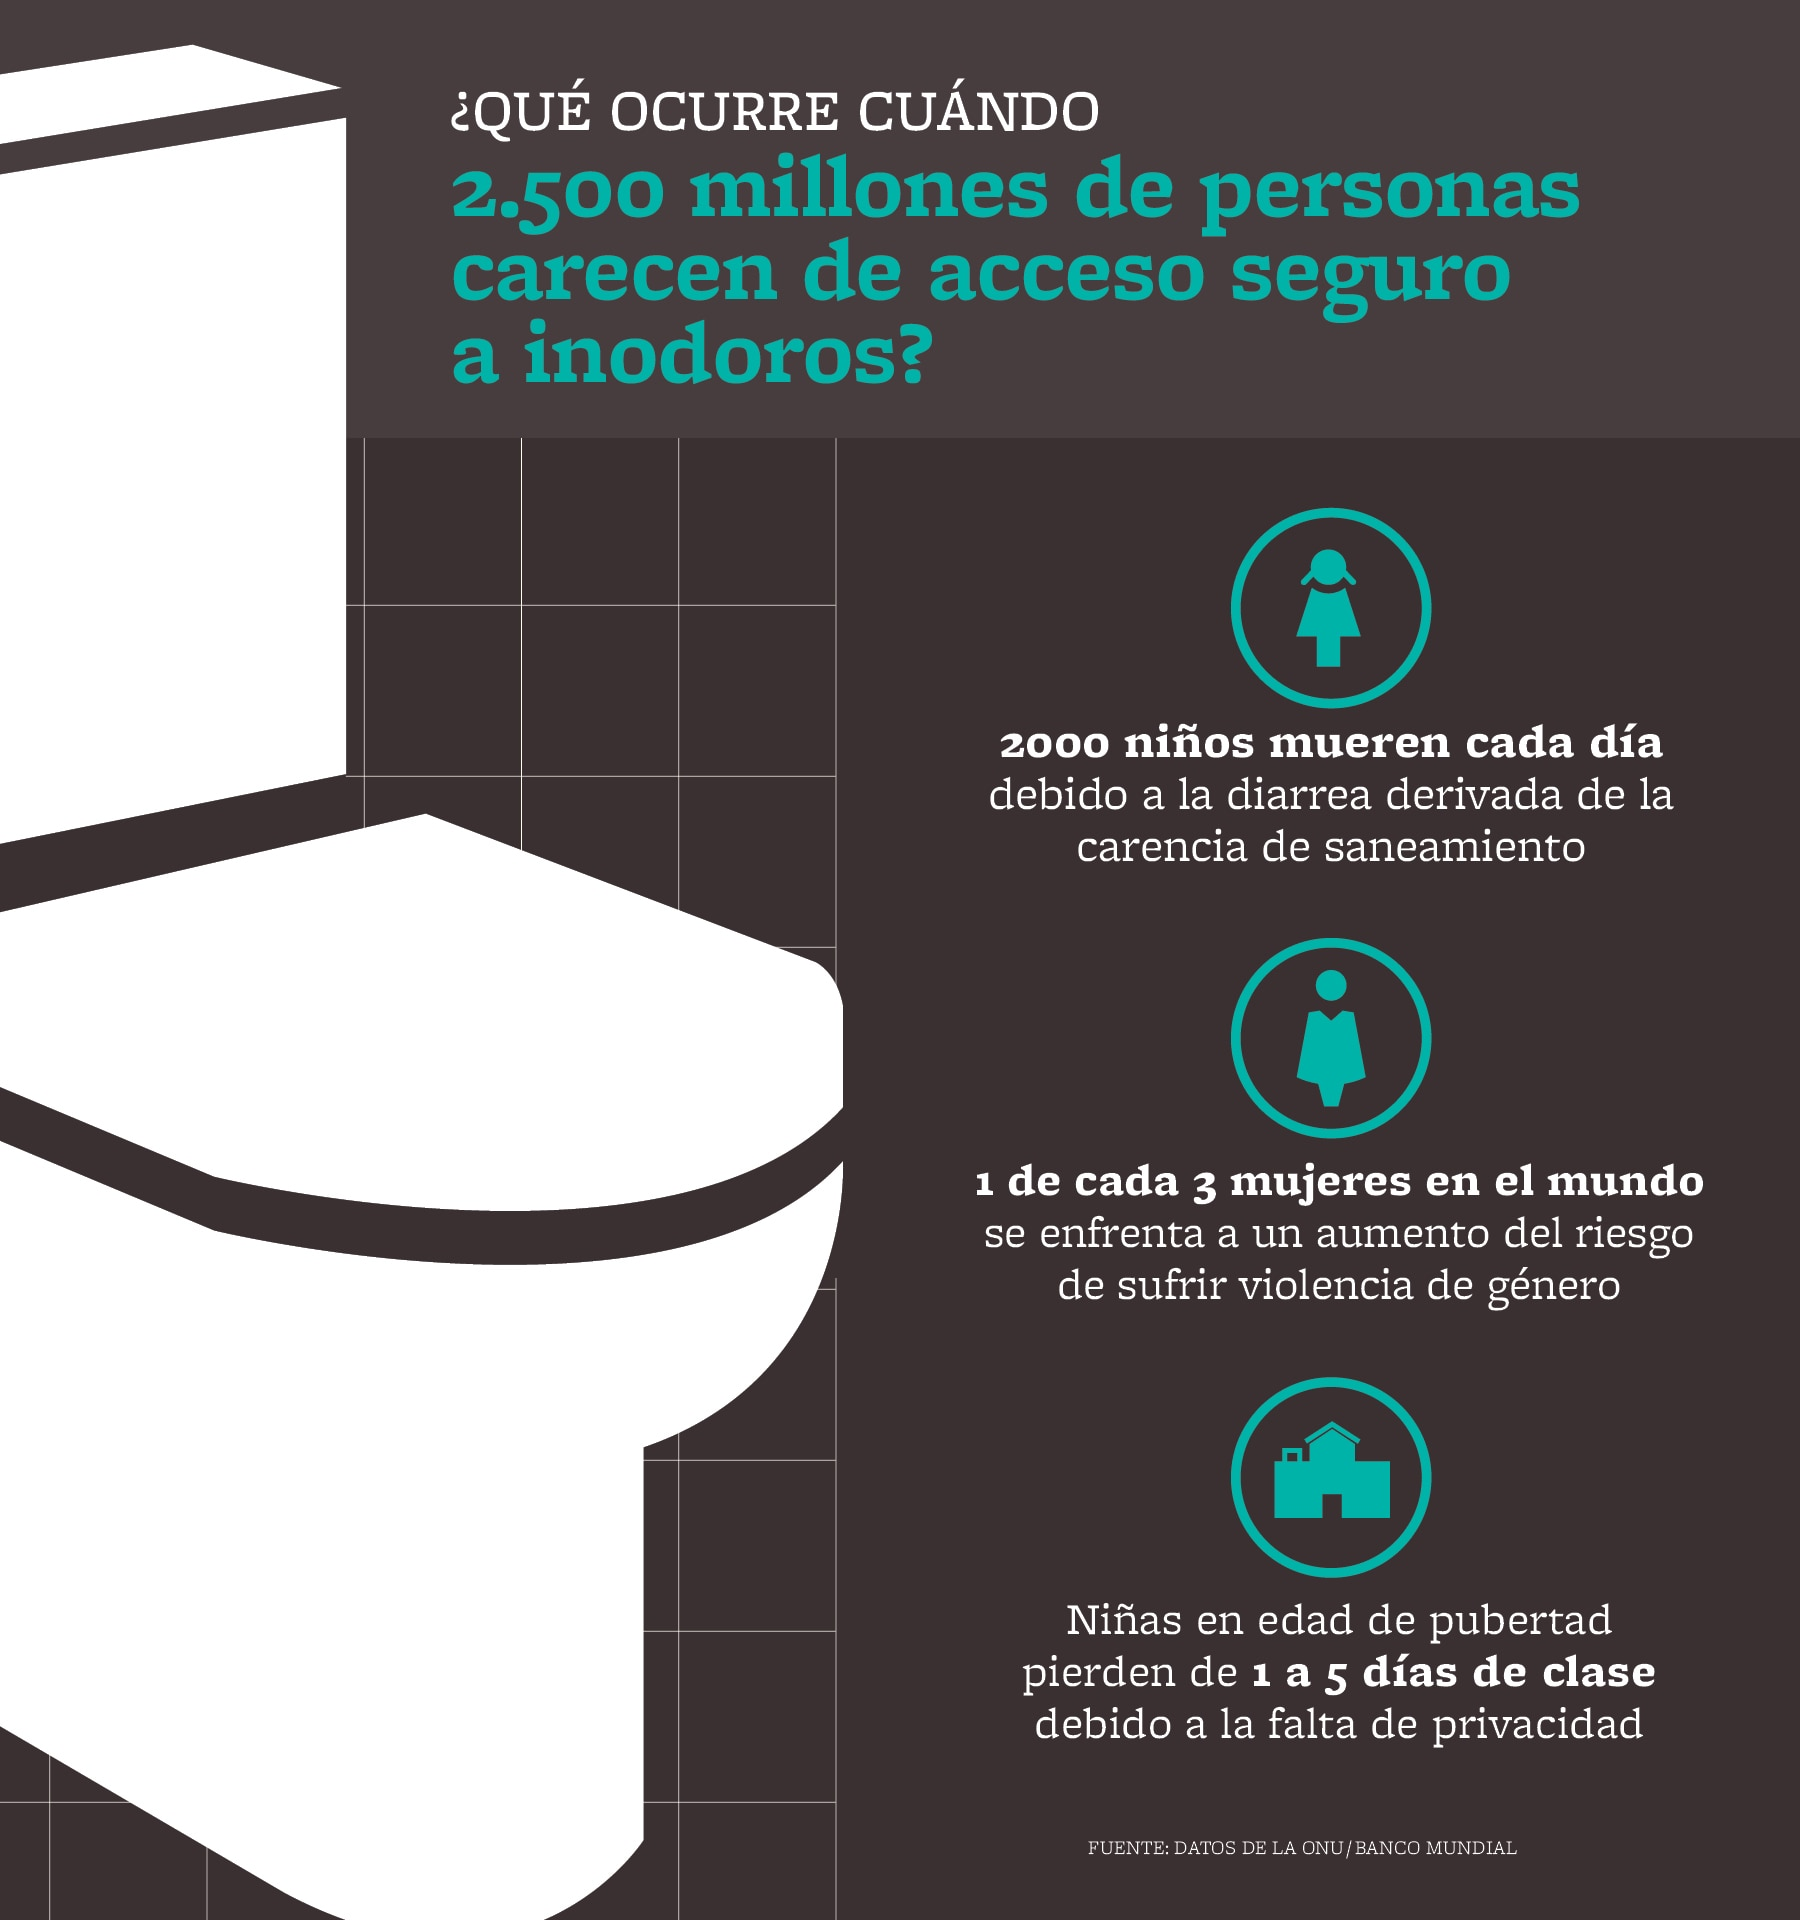 Infográfico de inodoros seguros